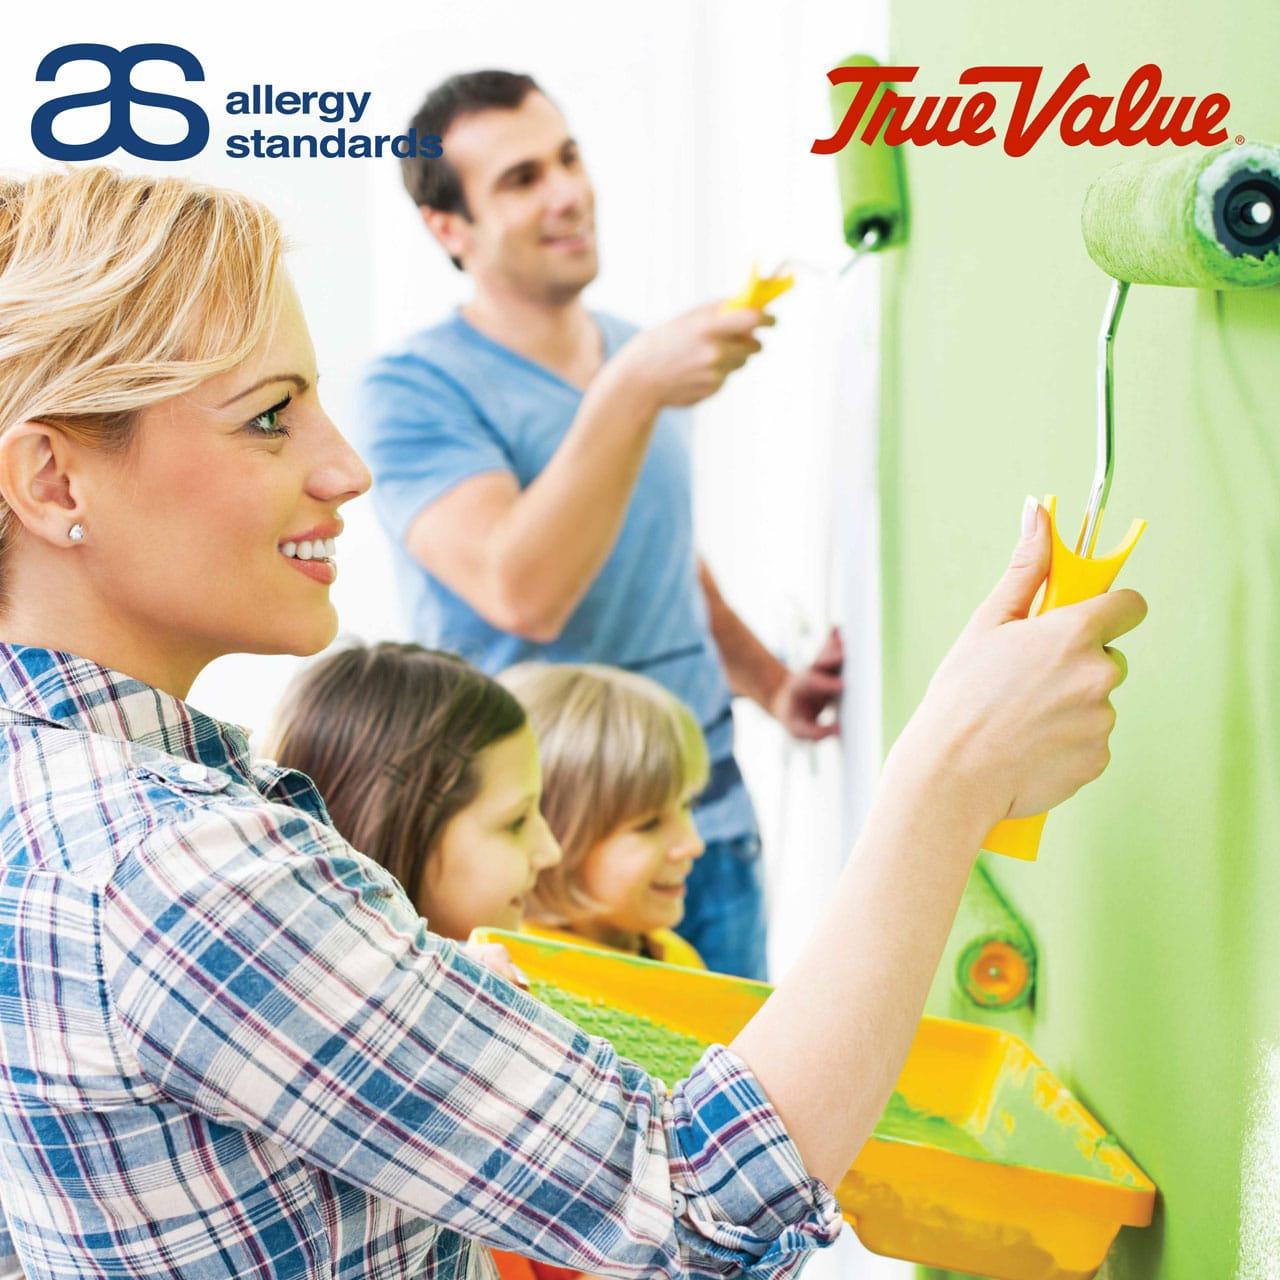 True-Value-Allergy-Standards-Brand-Promises-Healthier-Homes paint